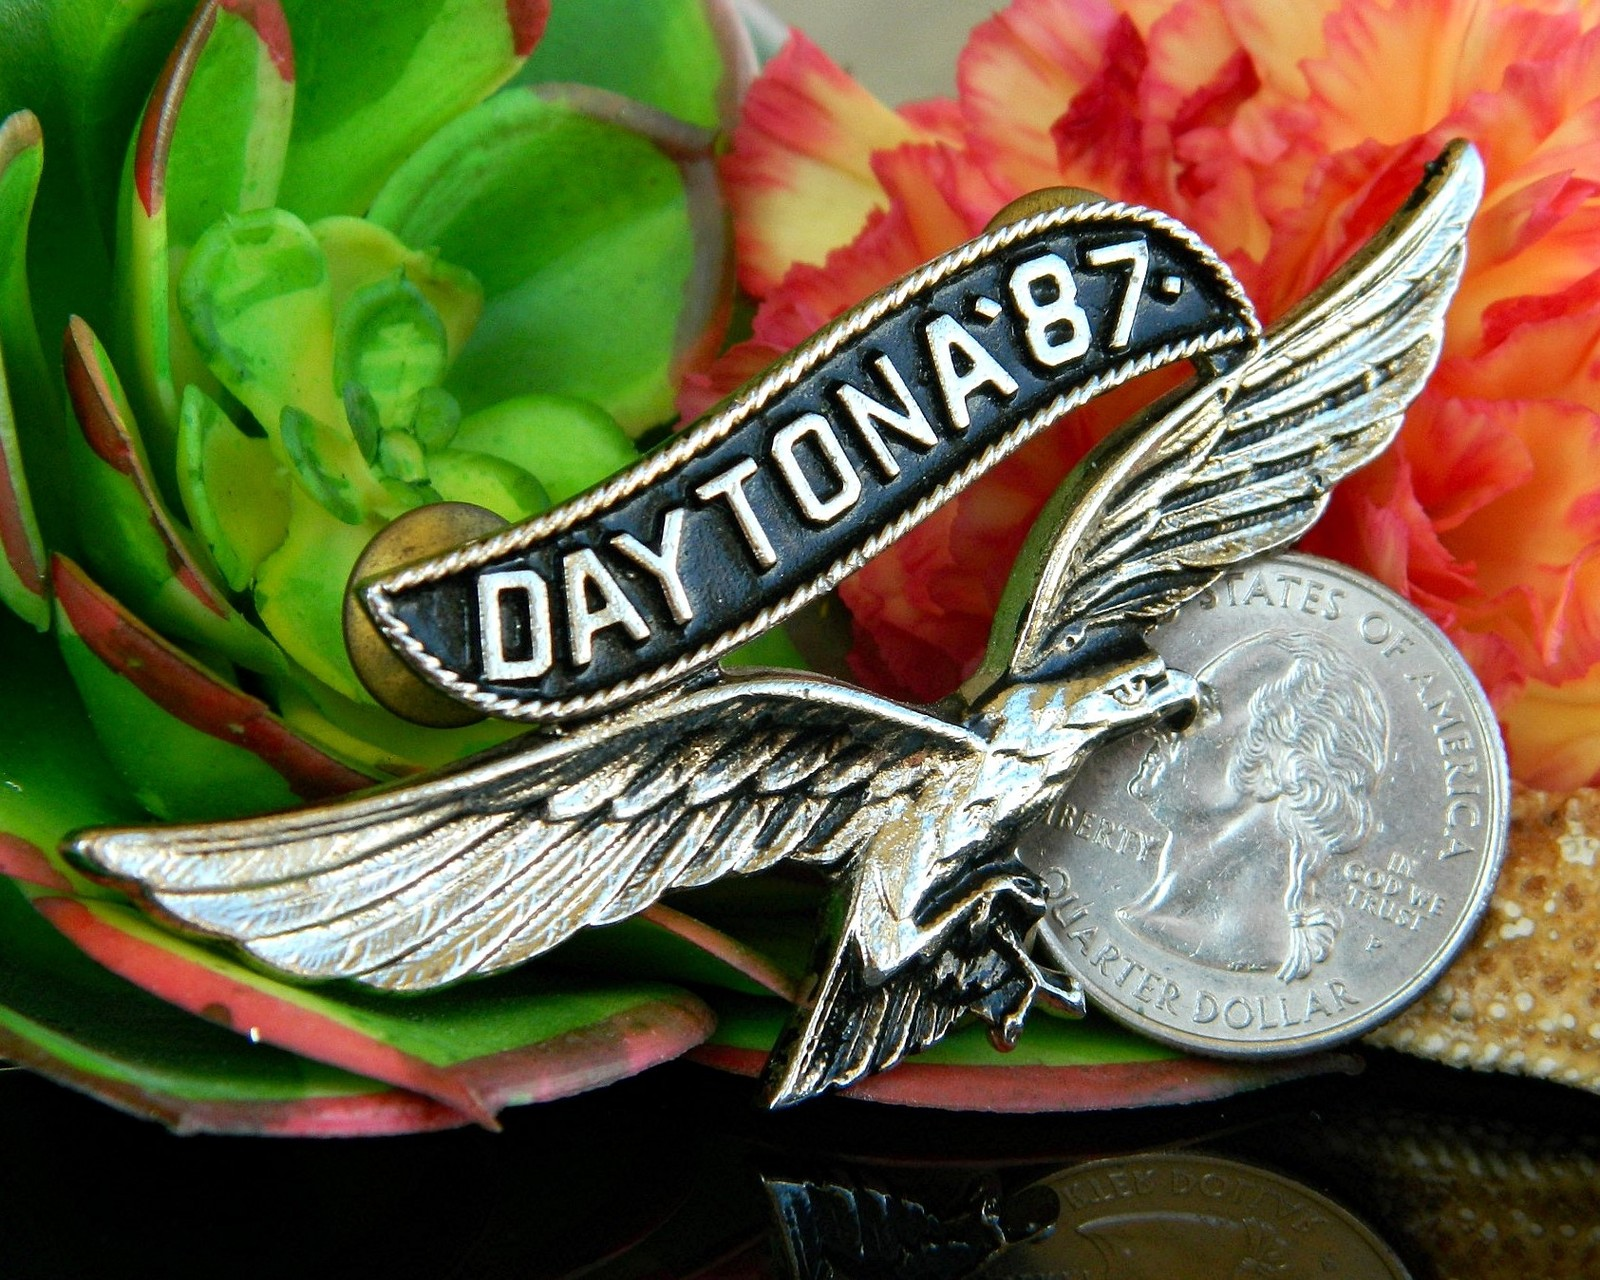 Vintage Daytona 1987 Motorcycle Rally Soaring Eagle Pin Jacket Biker image 2